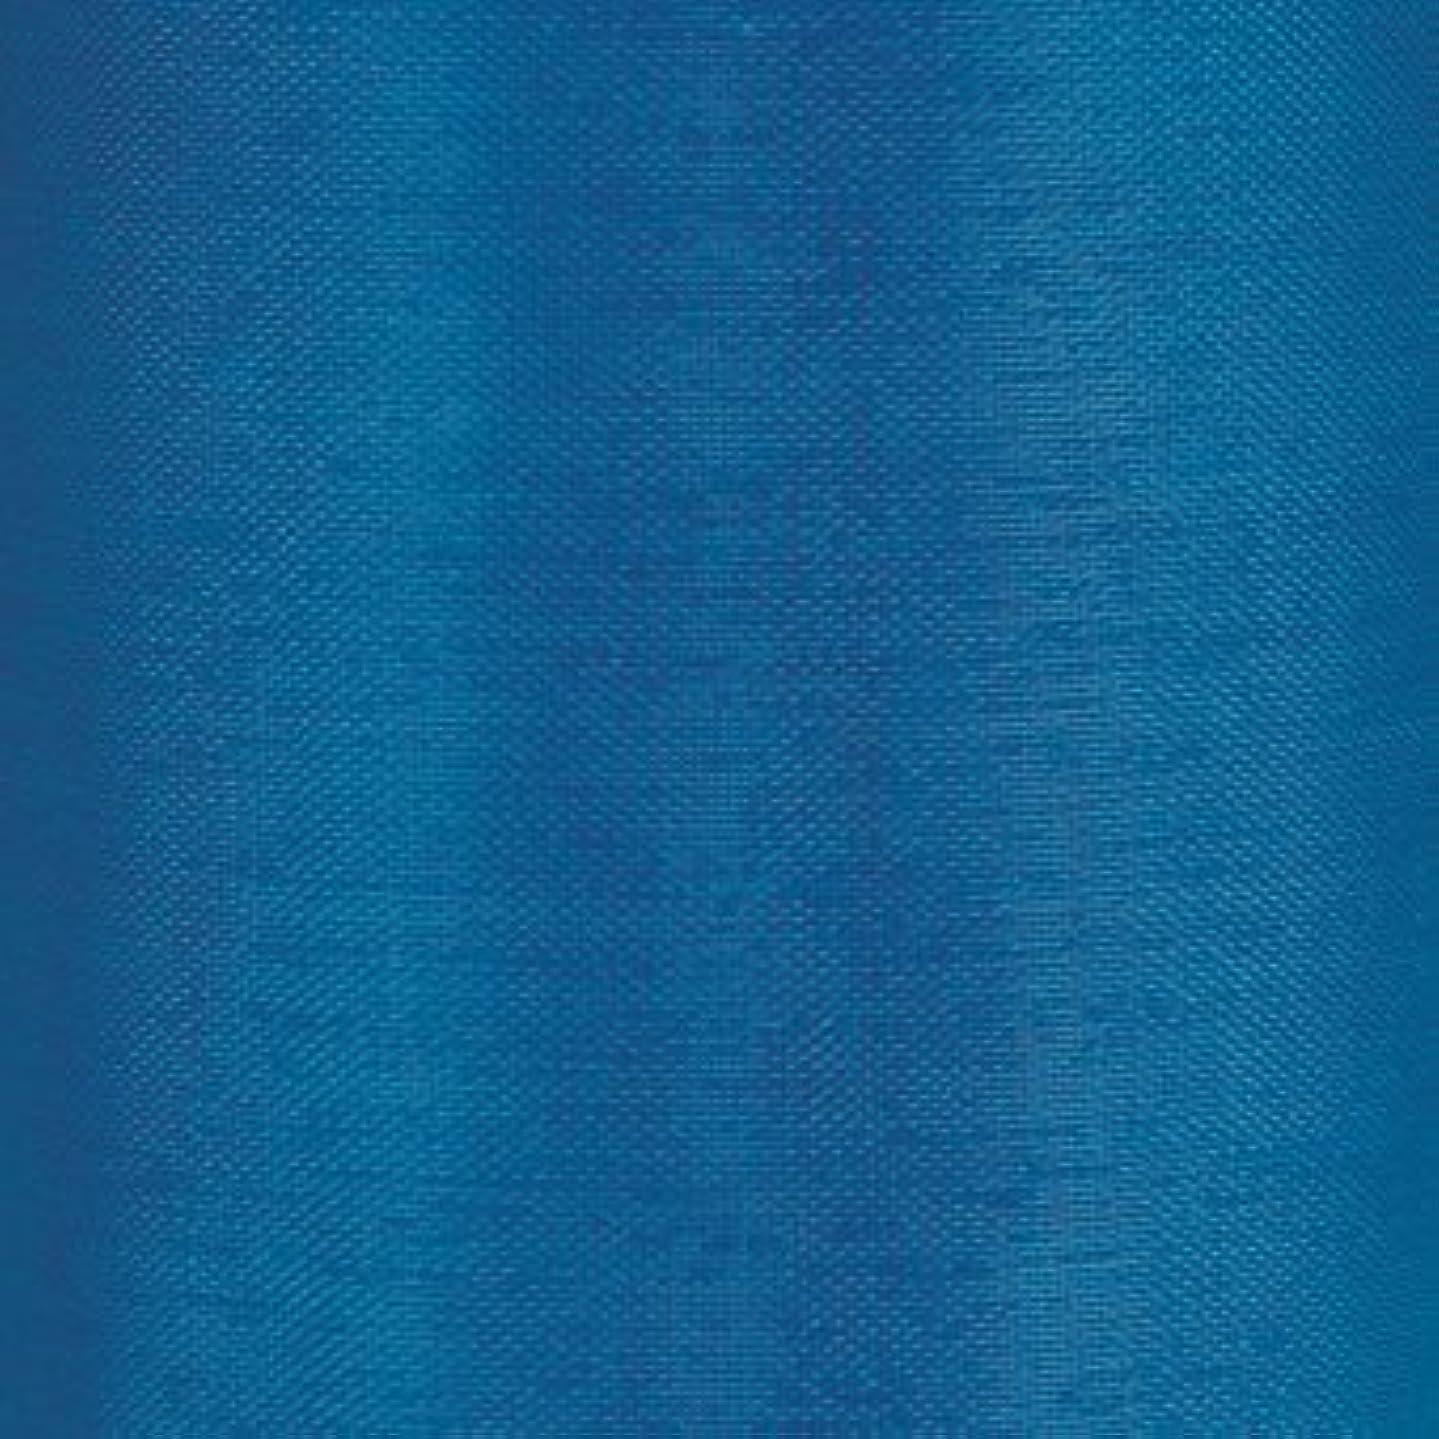 WEDGEWOOD BLUE ORGANZA RIBBON - 70MM X 25Mt FROM CLUB GREEN